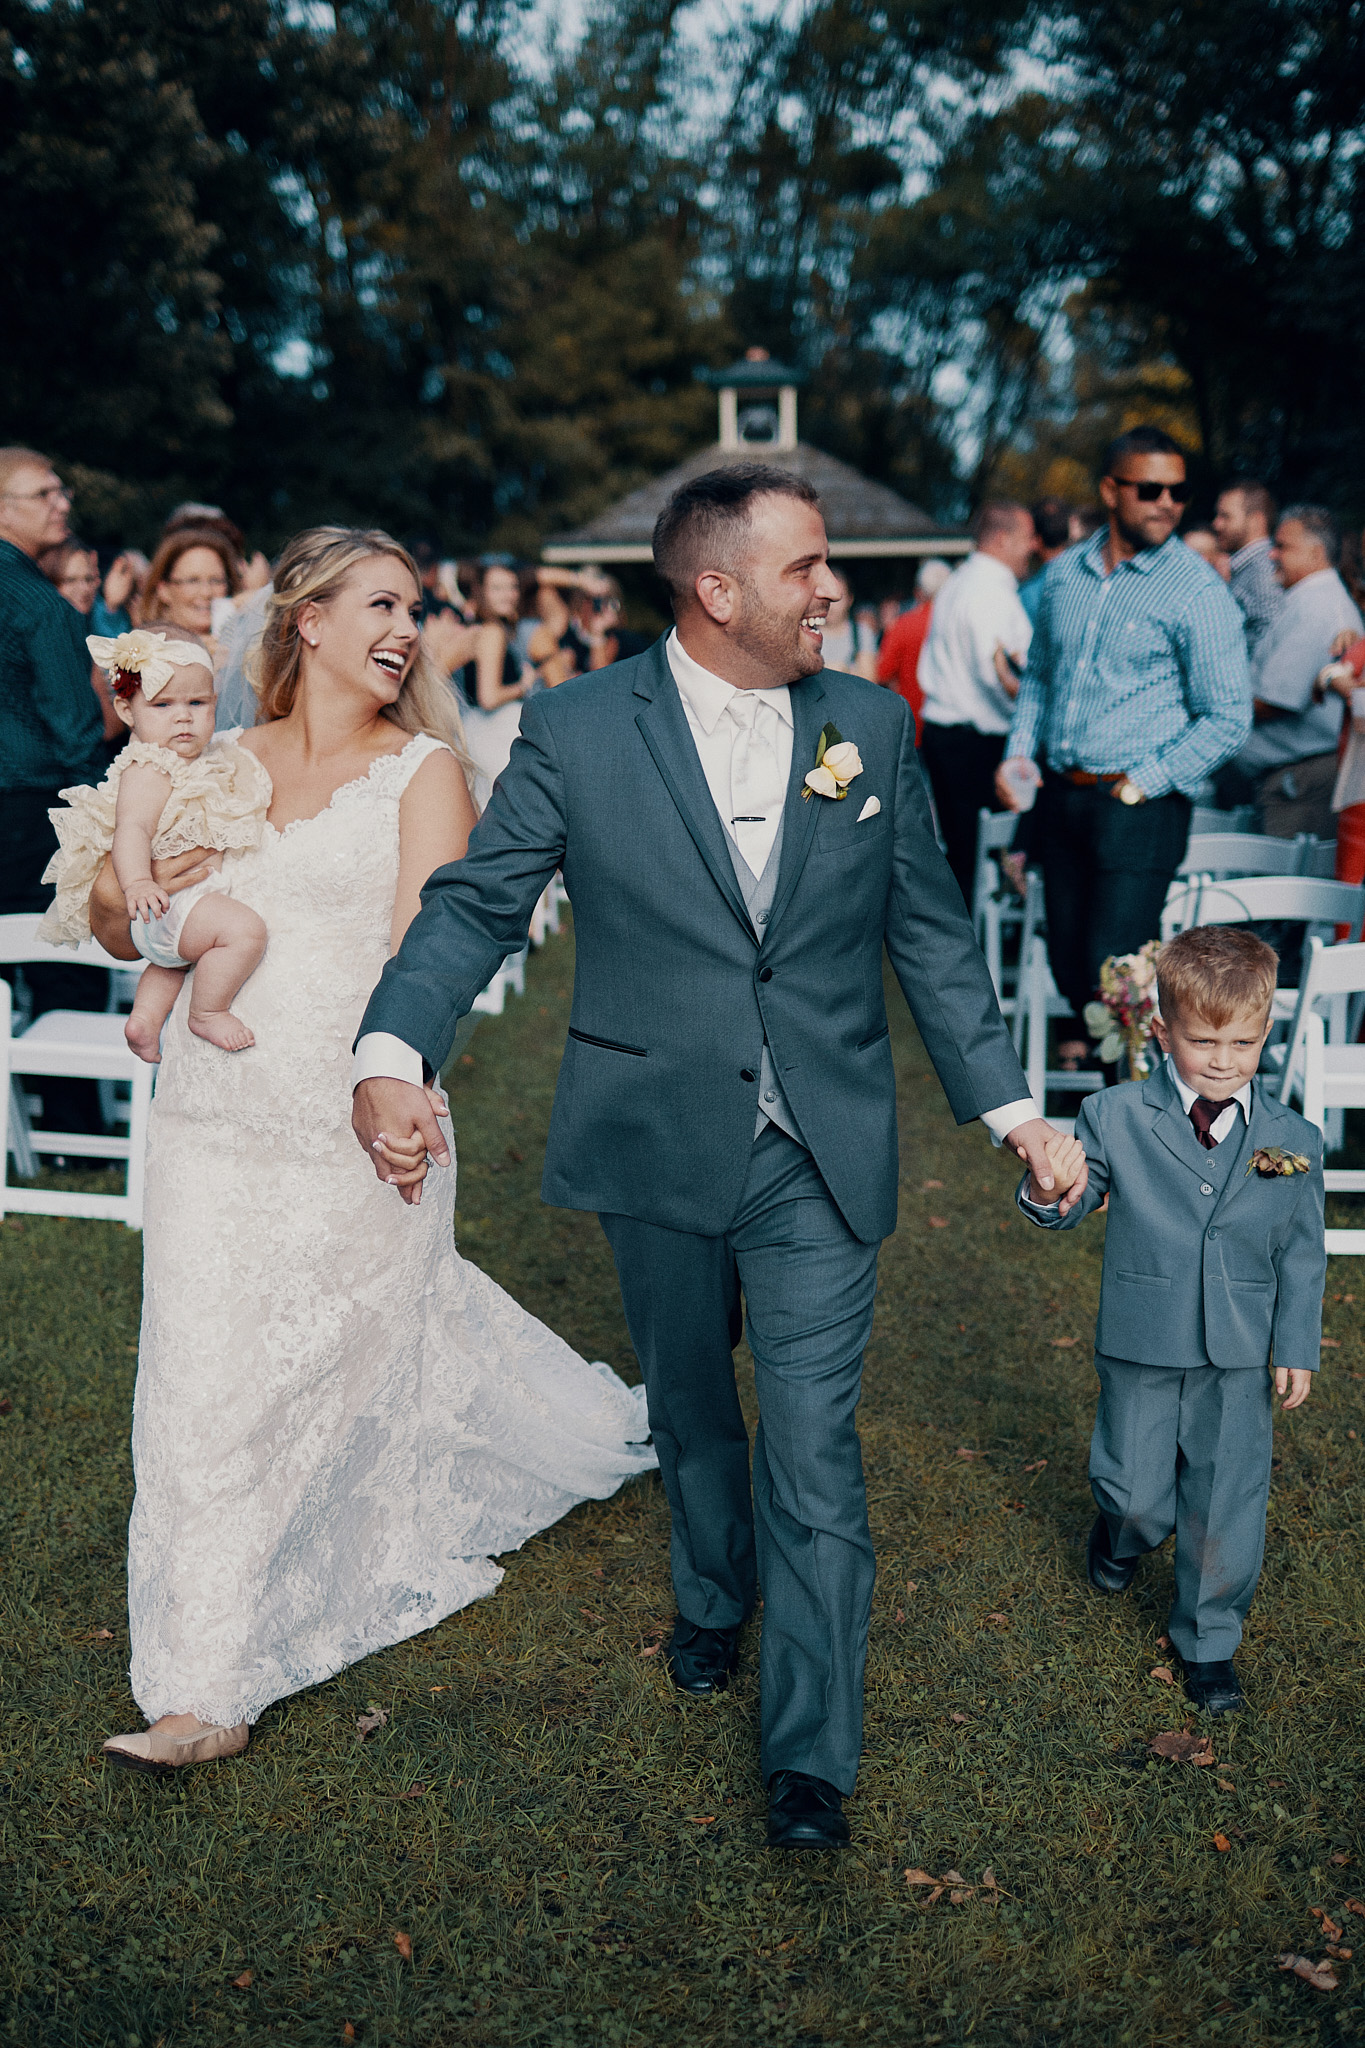 Minnetonka_Orchard_Wedding_Photography_High_End_Minneapolis_Brand_Photographer_Something_Candid_033.JPG